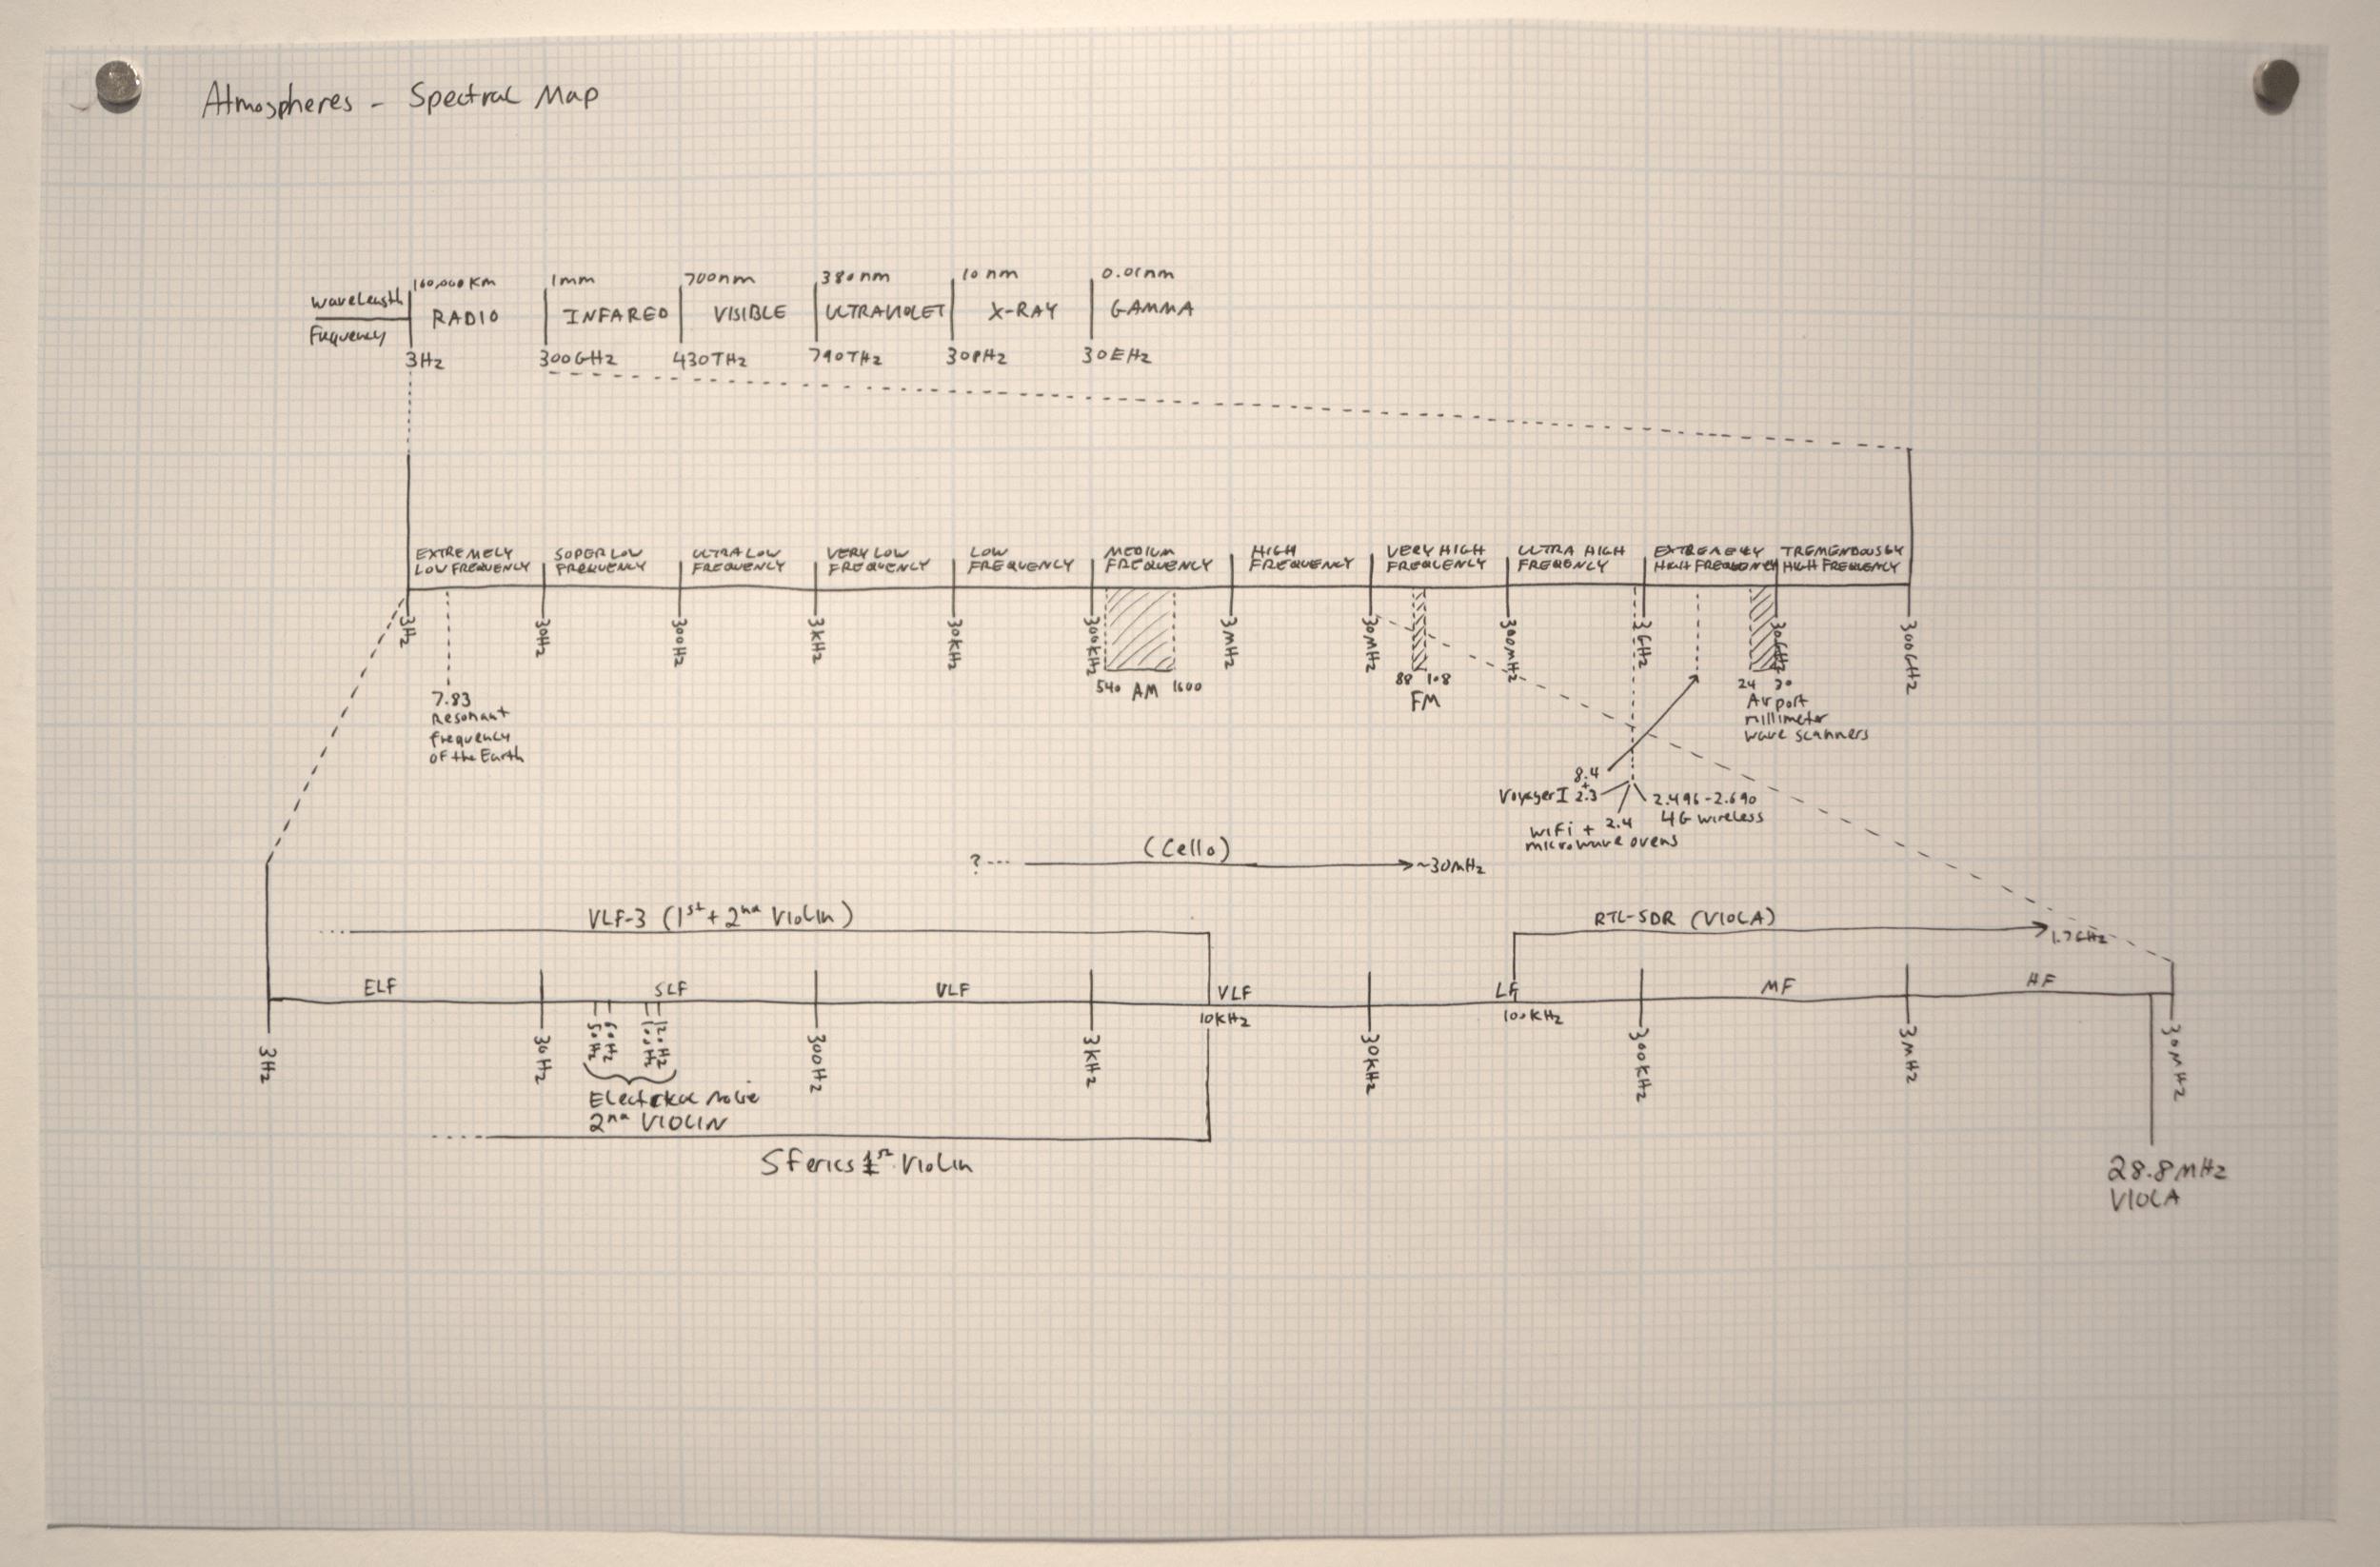 Spectrum maps of radios